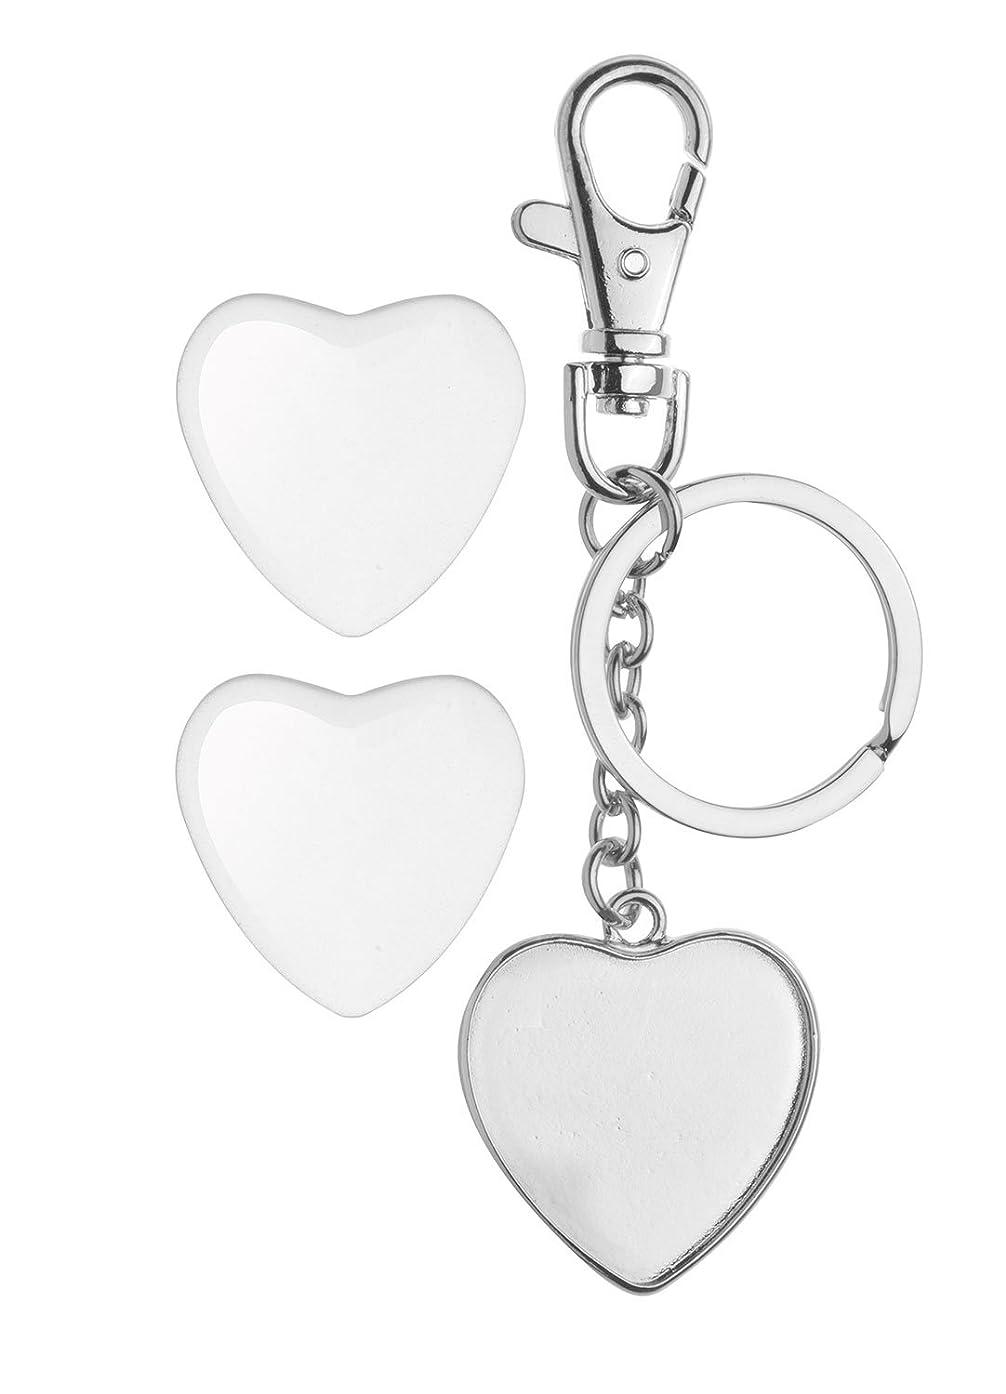 Glorex GmbH 6?1633?024?Cabochon Silver Double Sided Heart Shape Keyring?–?32?mm